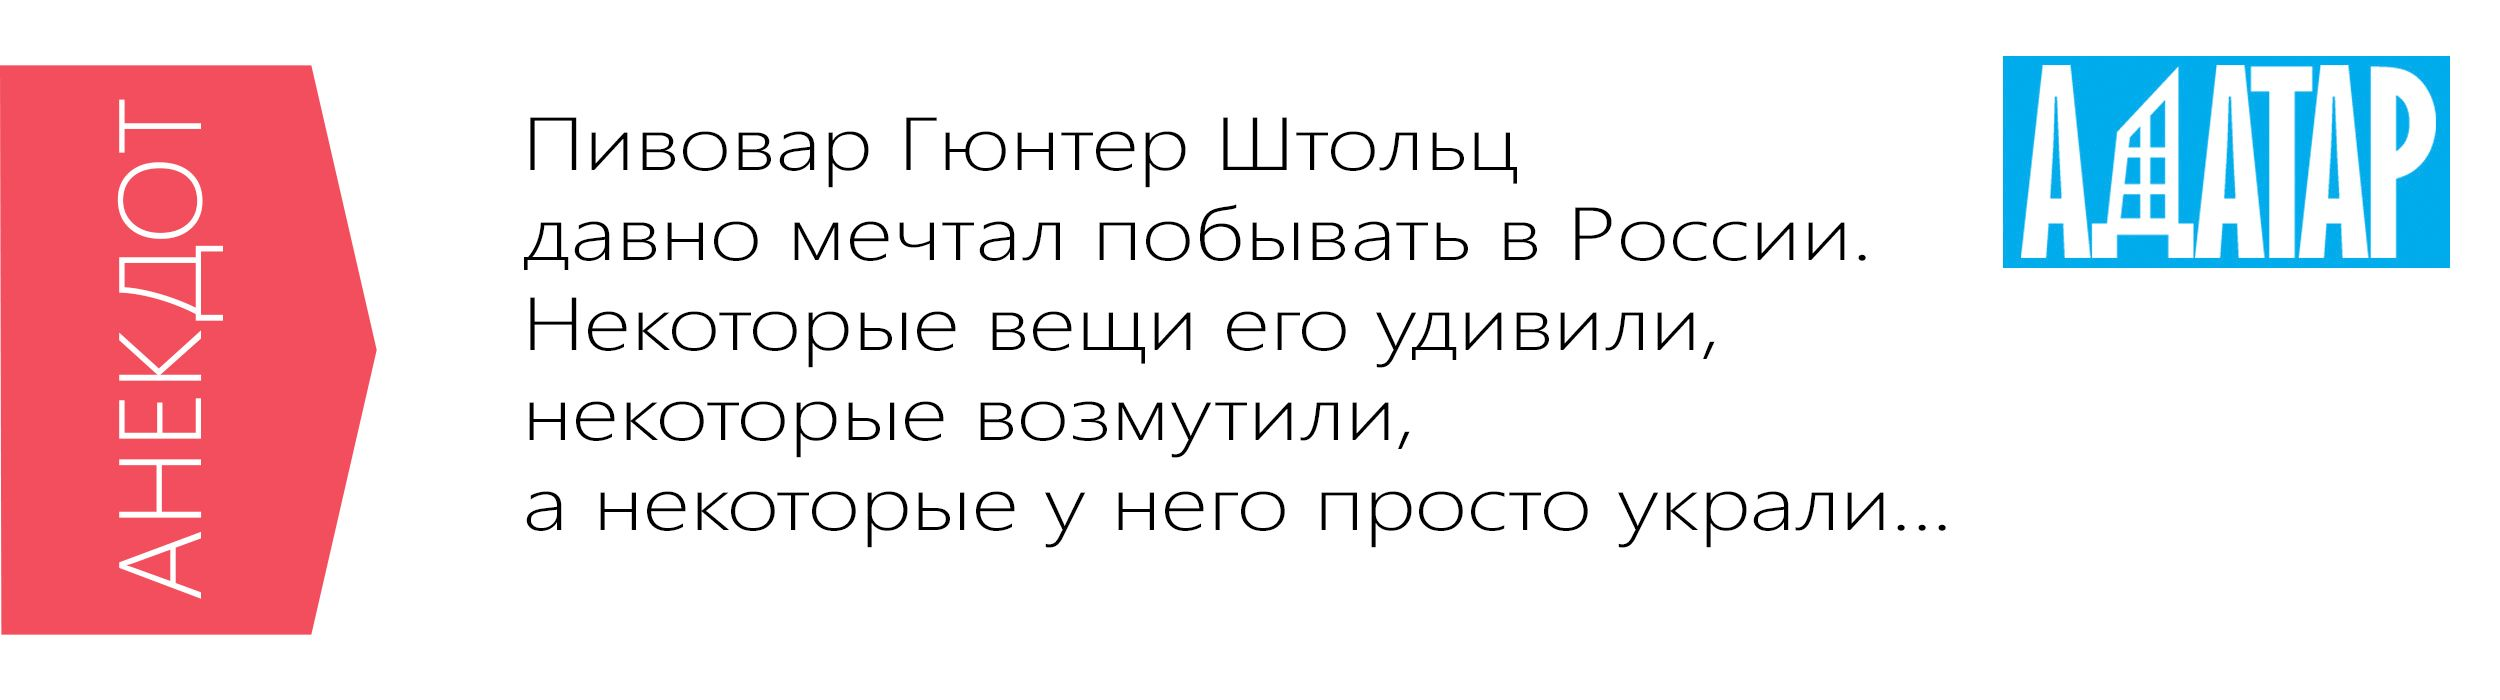 АНЕКДОТ 45.jpg